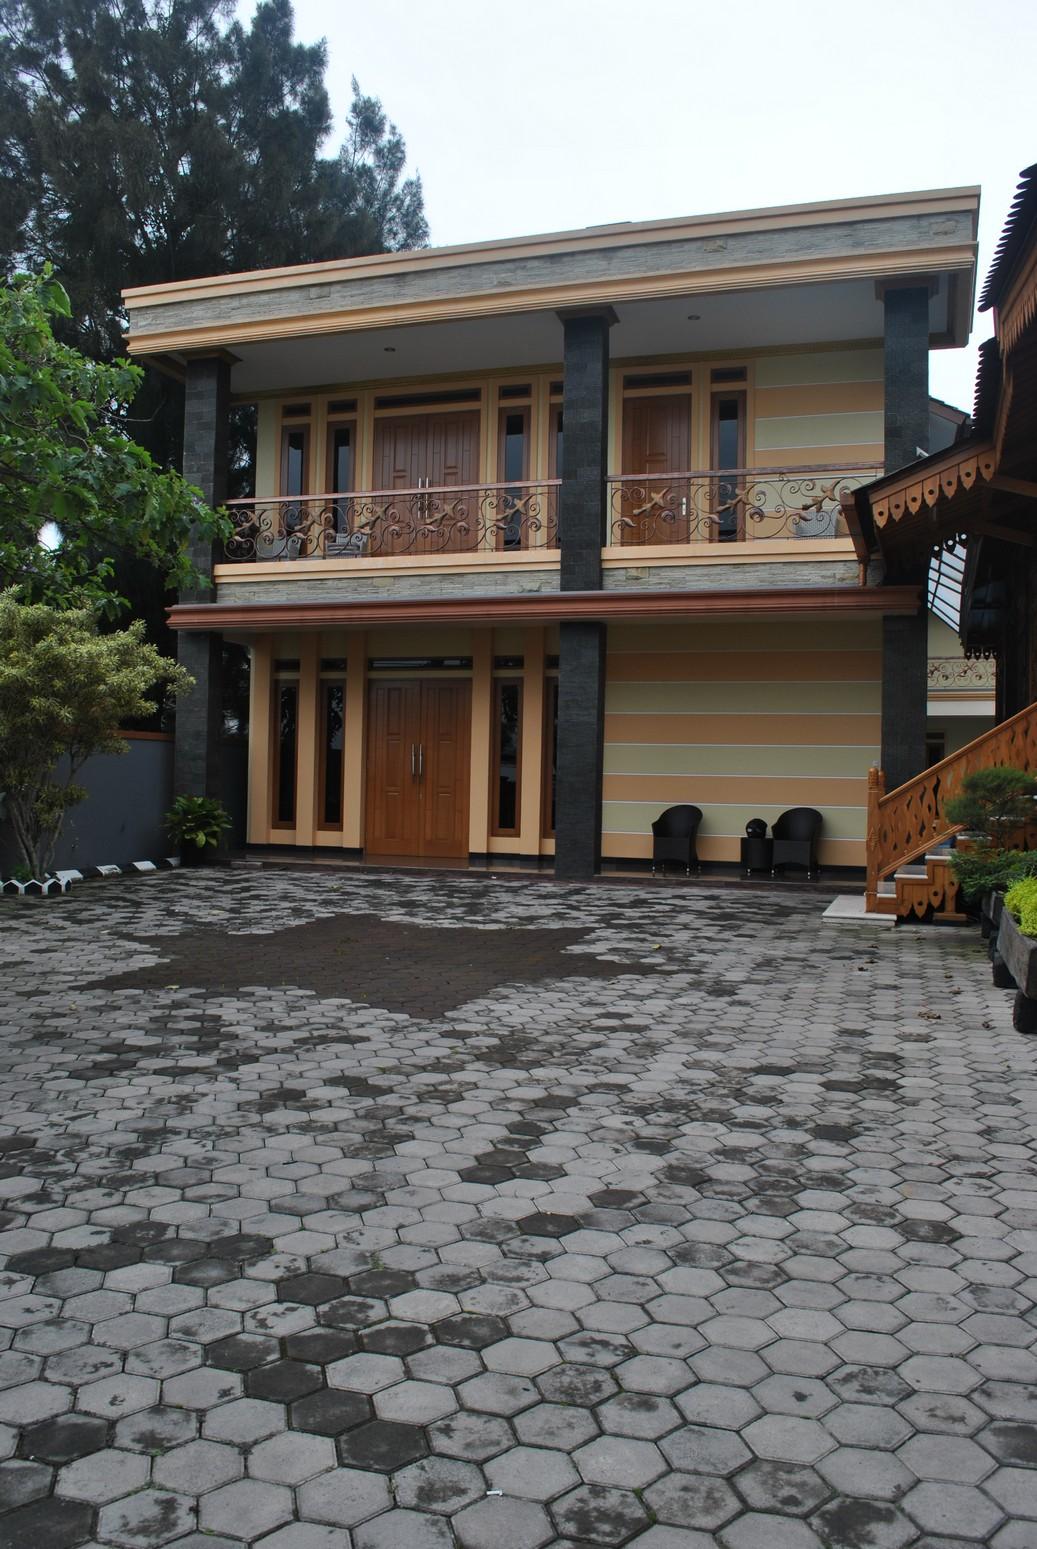 Sewa Villa Di Puncak Ada Kolam Renang Pribadi, Villa Hanjawar 10 Kamar